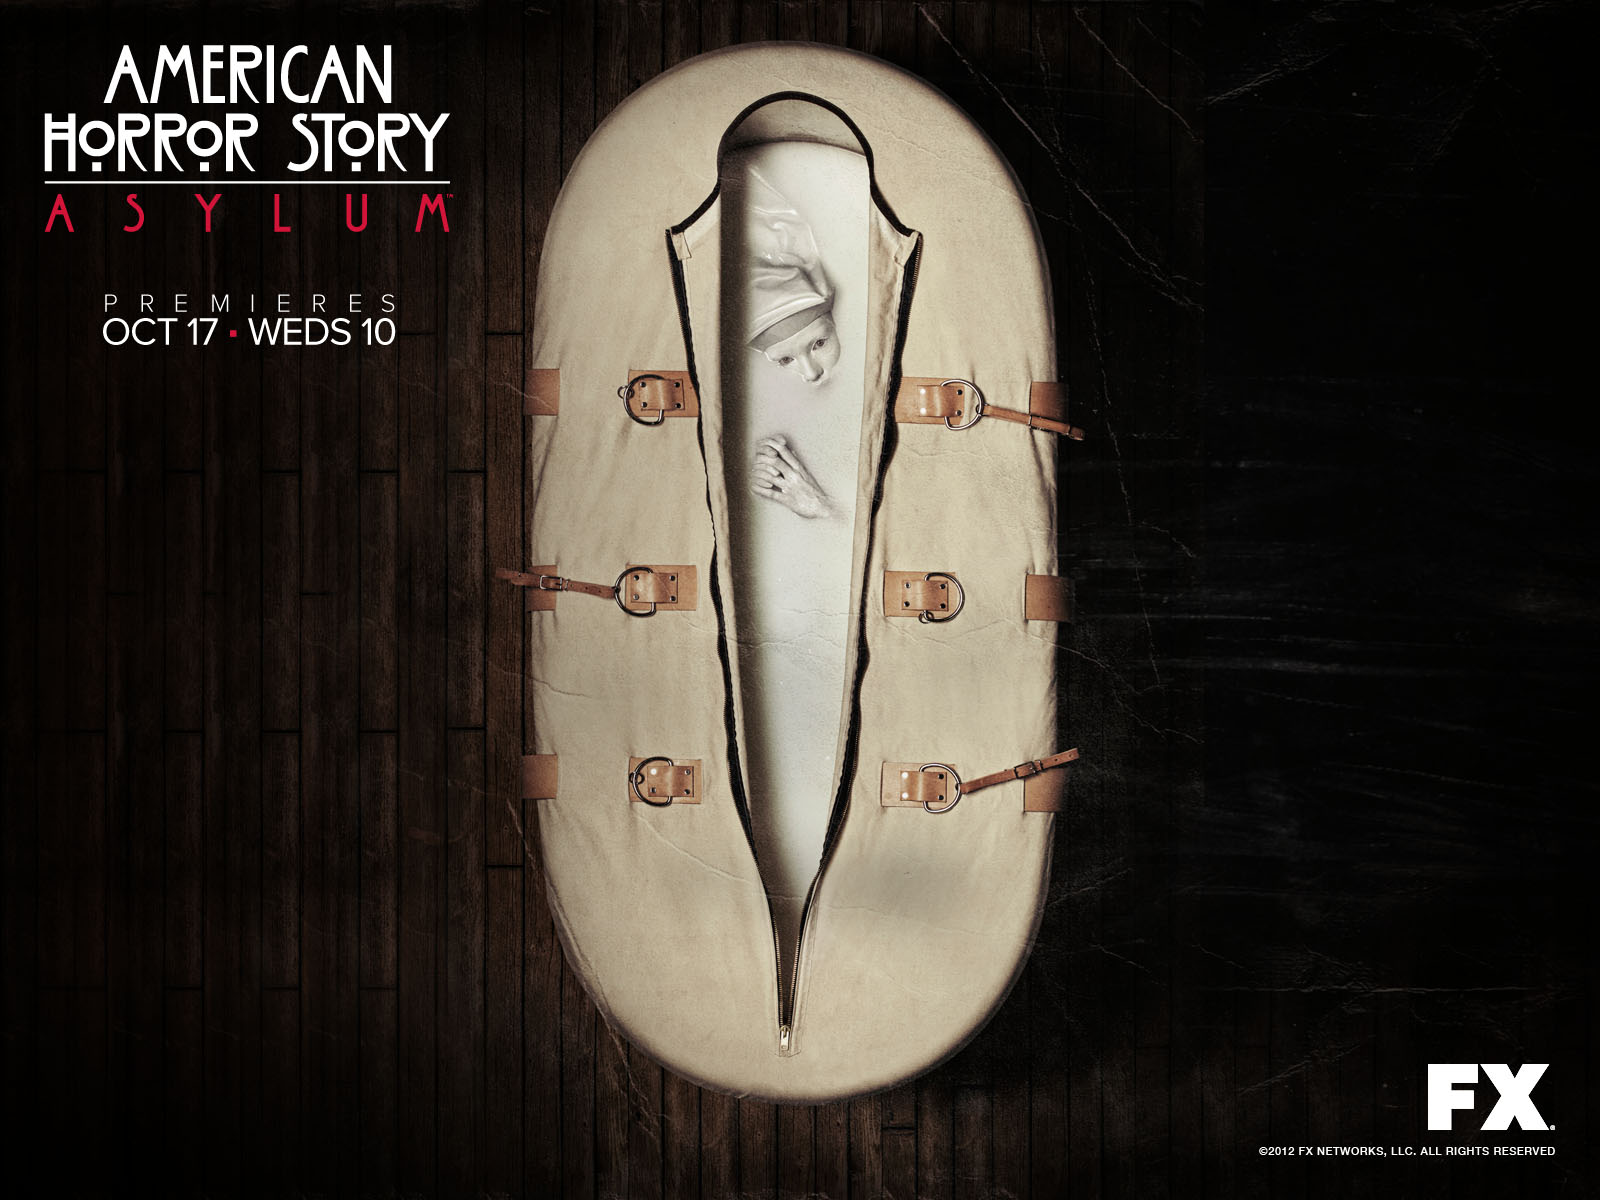 1600x1200px American Horror Story Asylum Wallpaper Wallpapersafari